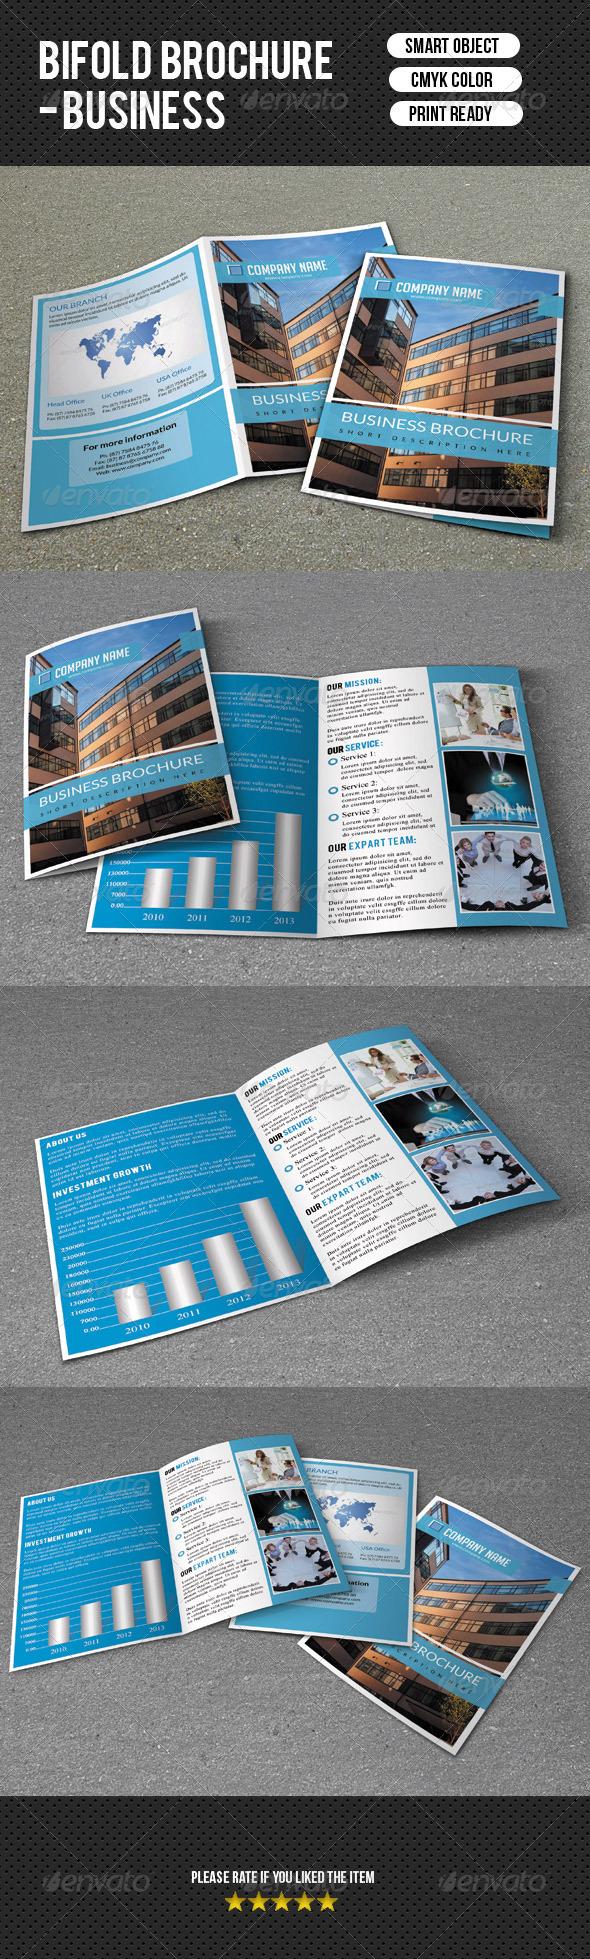 GraphicRiver Business Brochure 7362158